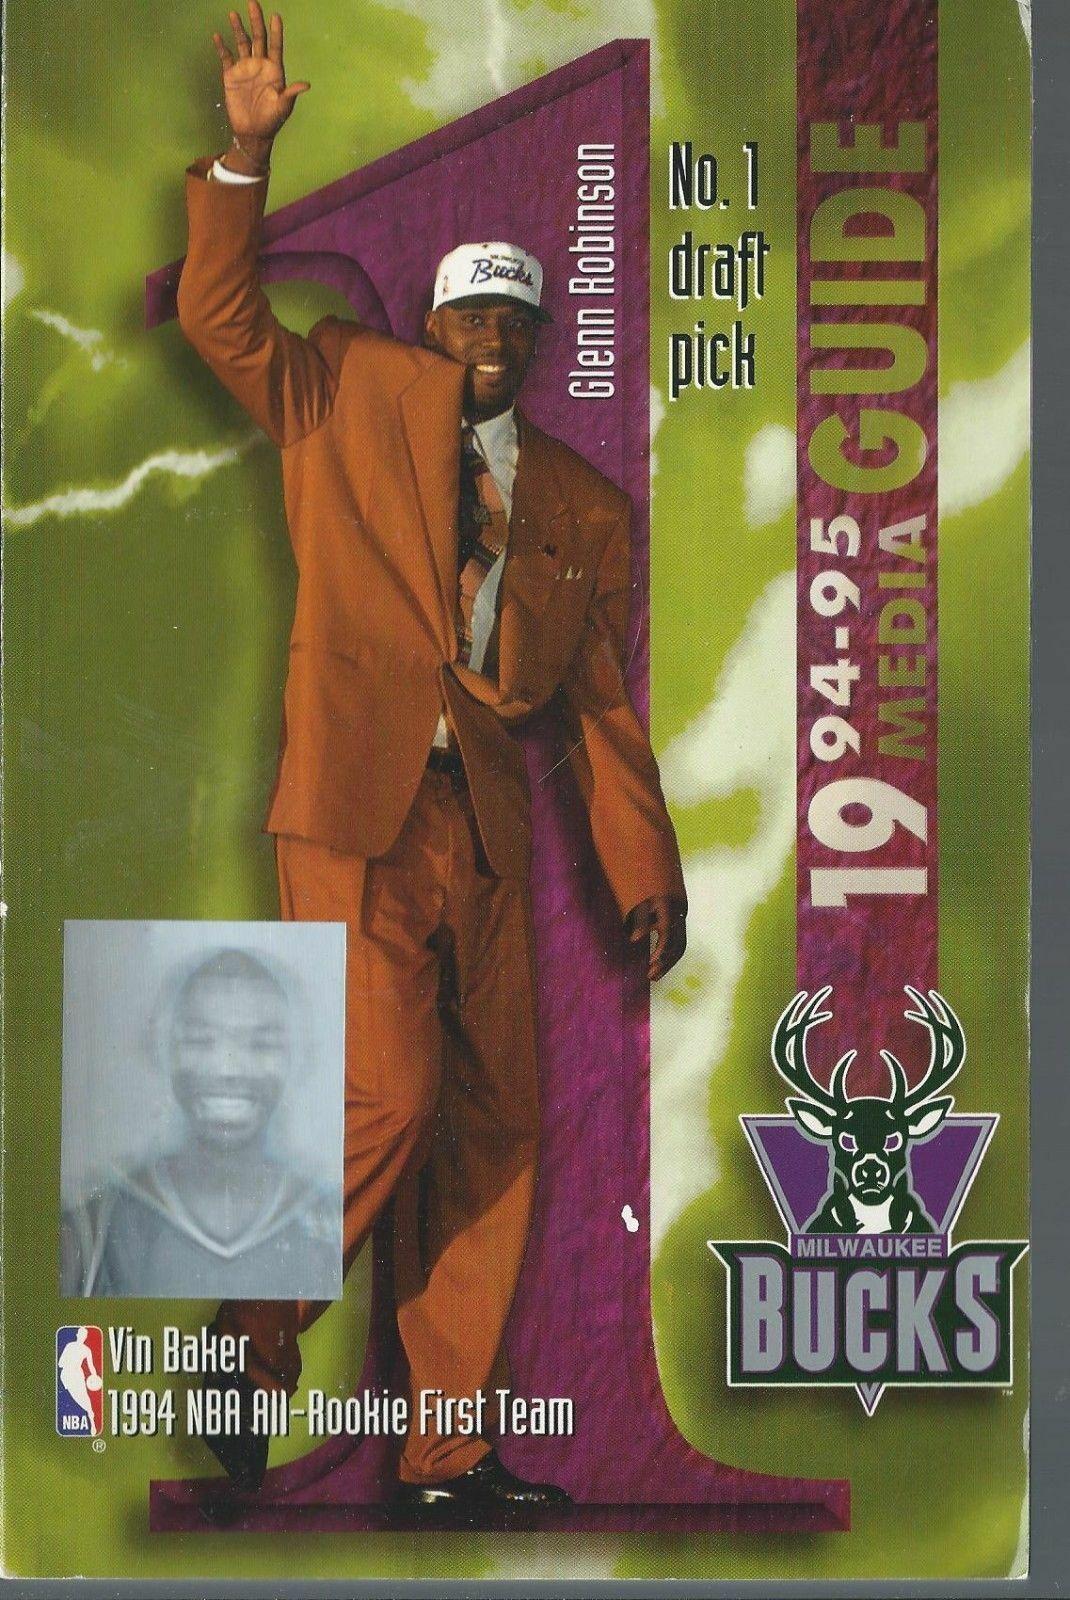 1994/1995 Milwaukee Bucks Official NBA Basketball Media Guide - Vin Baker Holo